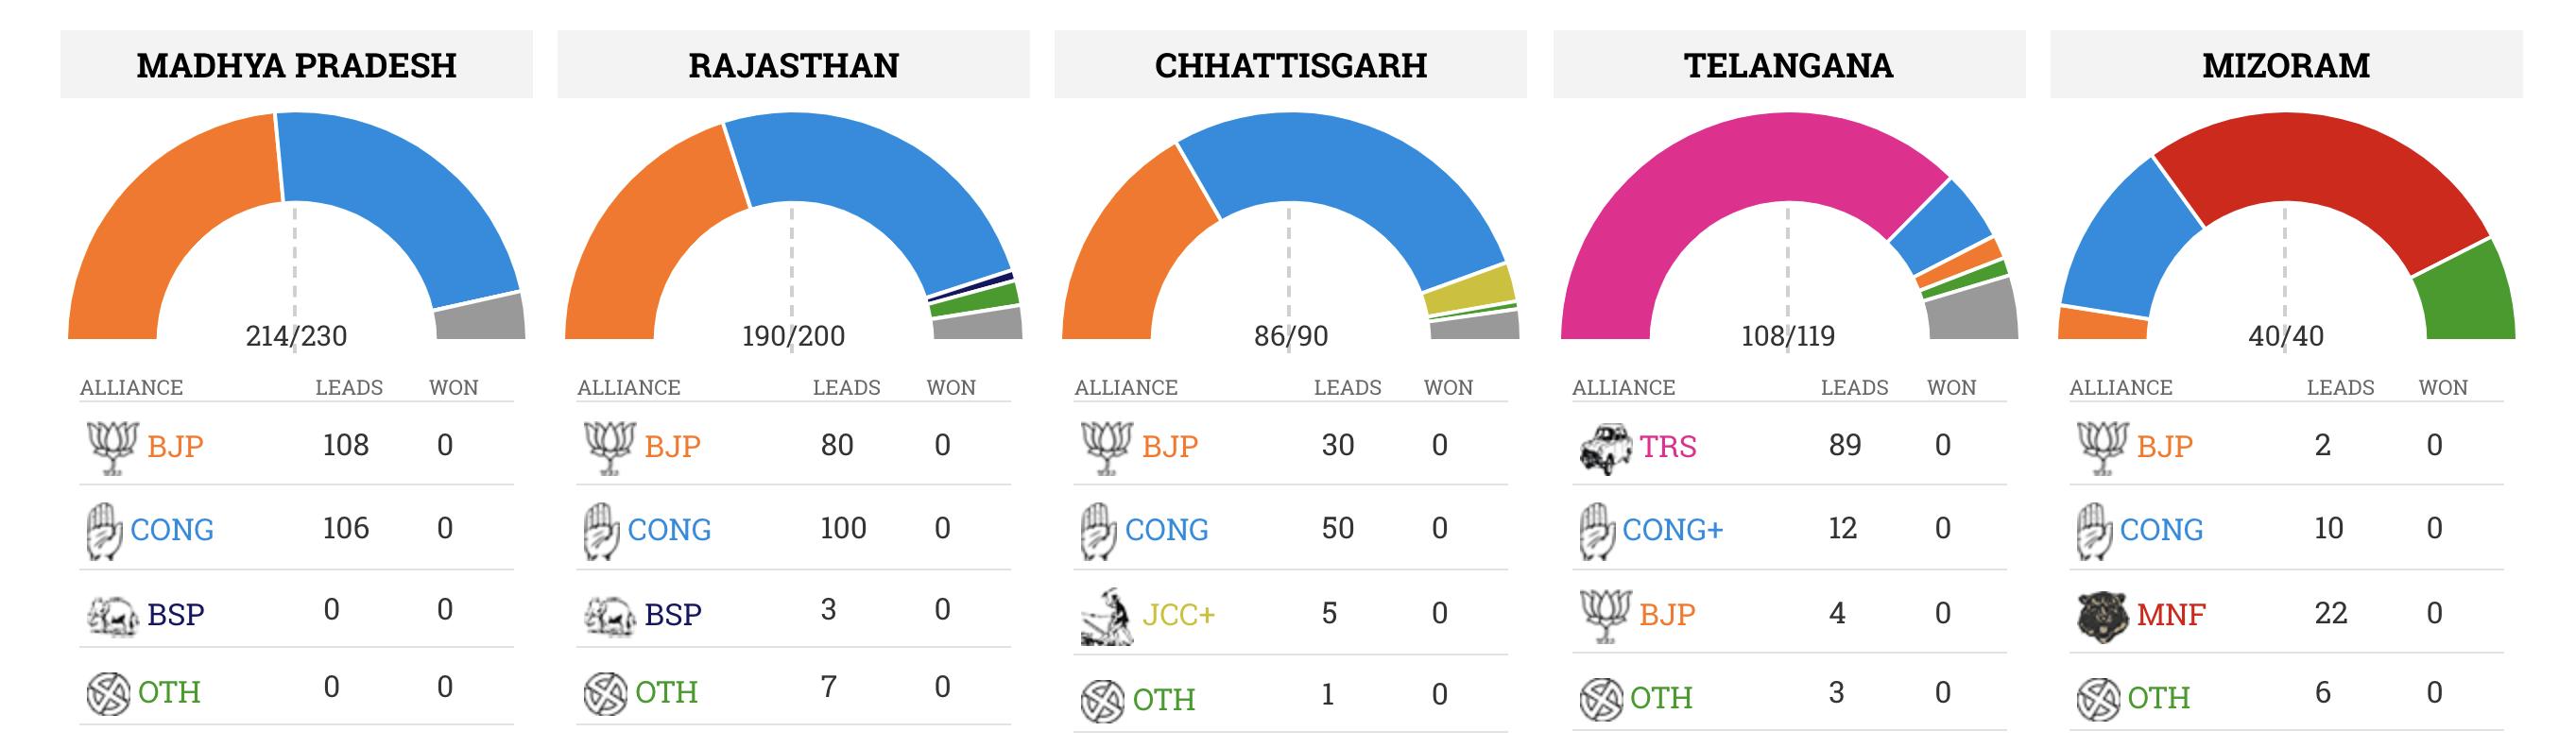 Assembly Elections 2018: Congress Leading in Chhattisgarh, Rajasthan; BJP Ahead in Madhya Pradesh